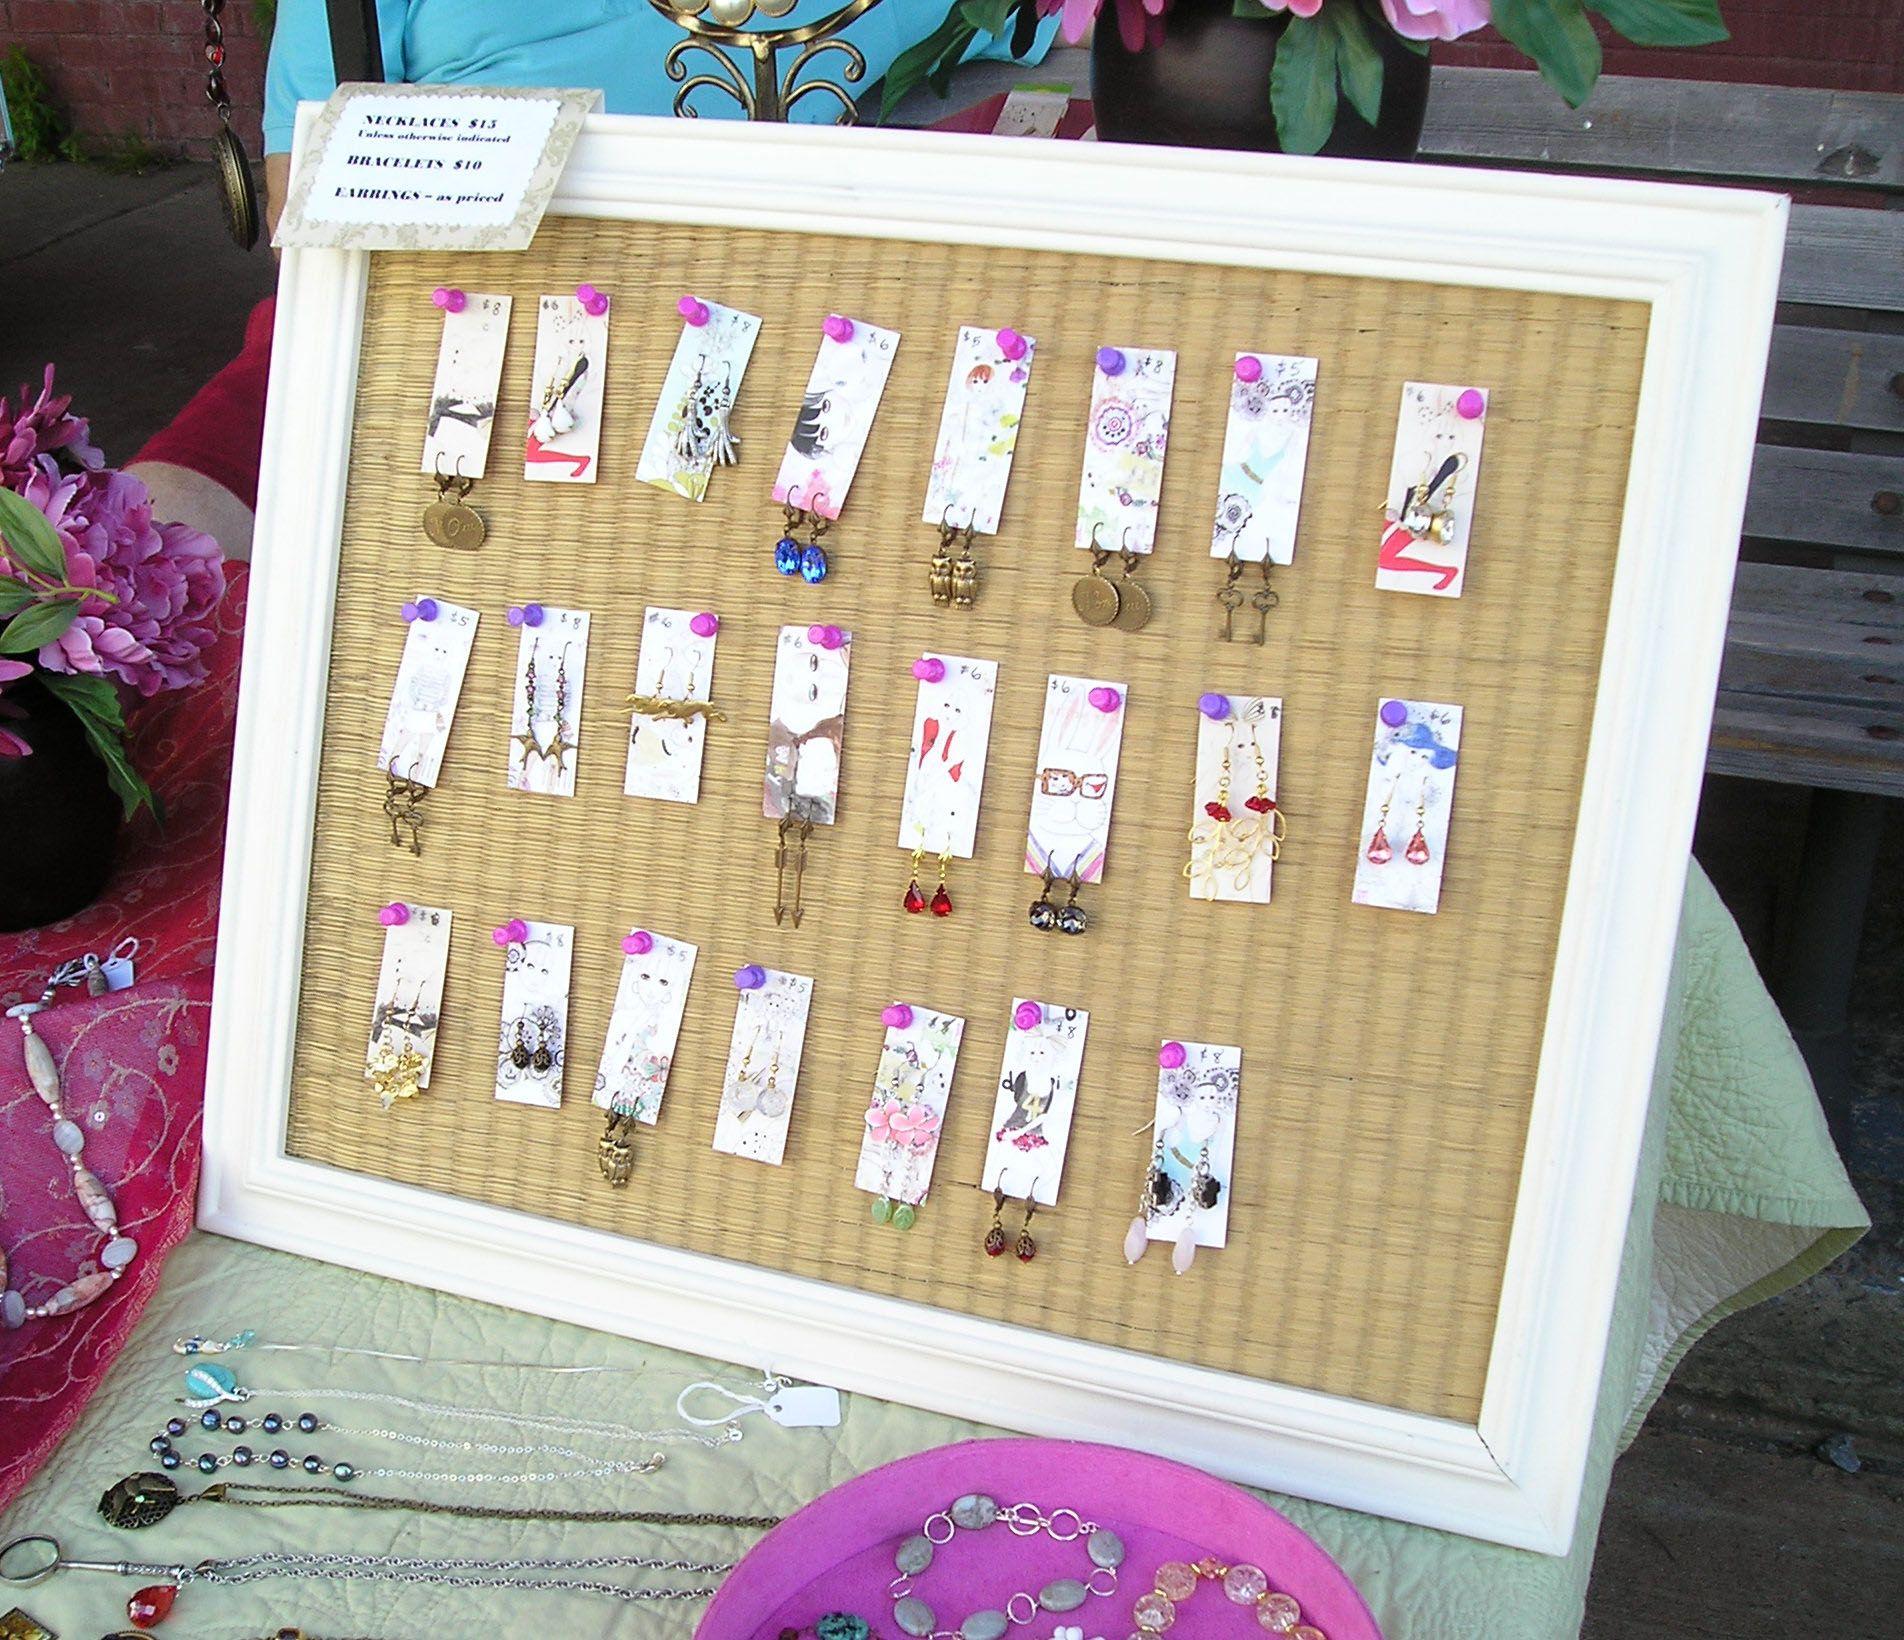 Make Your Own Jewellery Display Board: Earring Display - Google Search